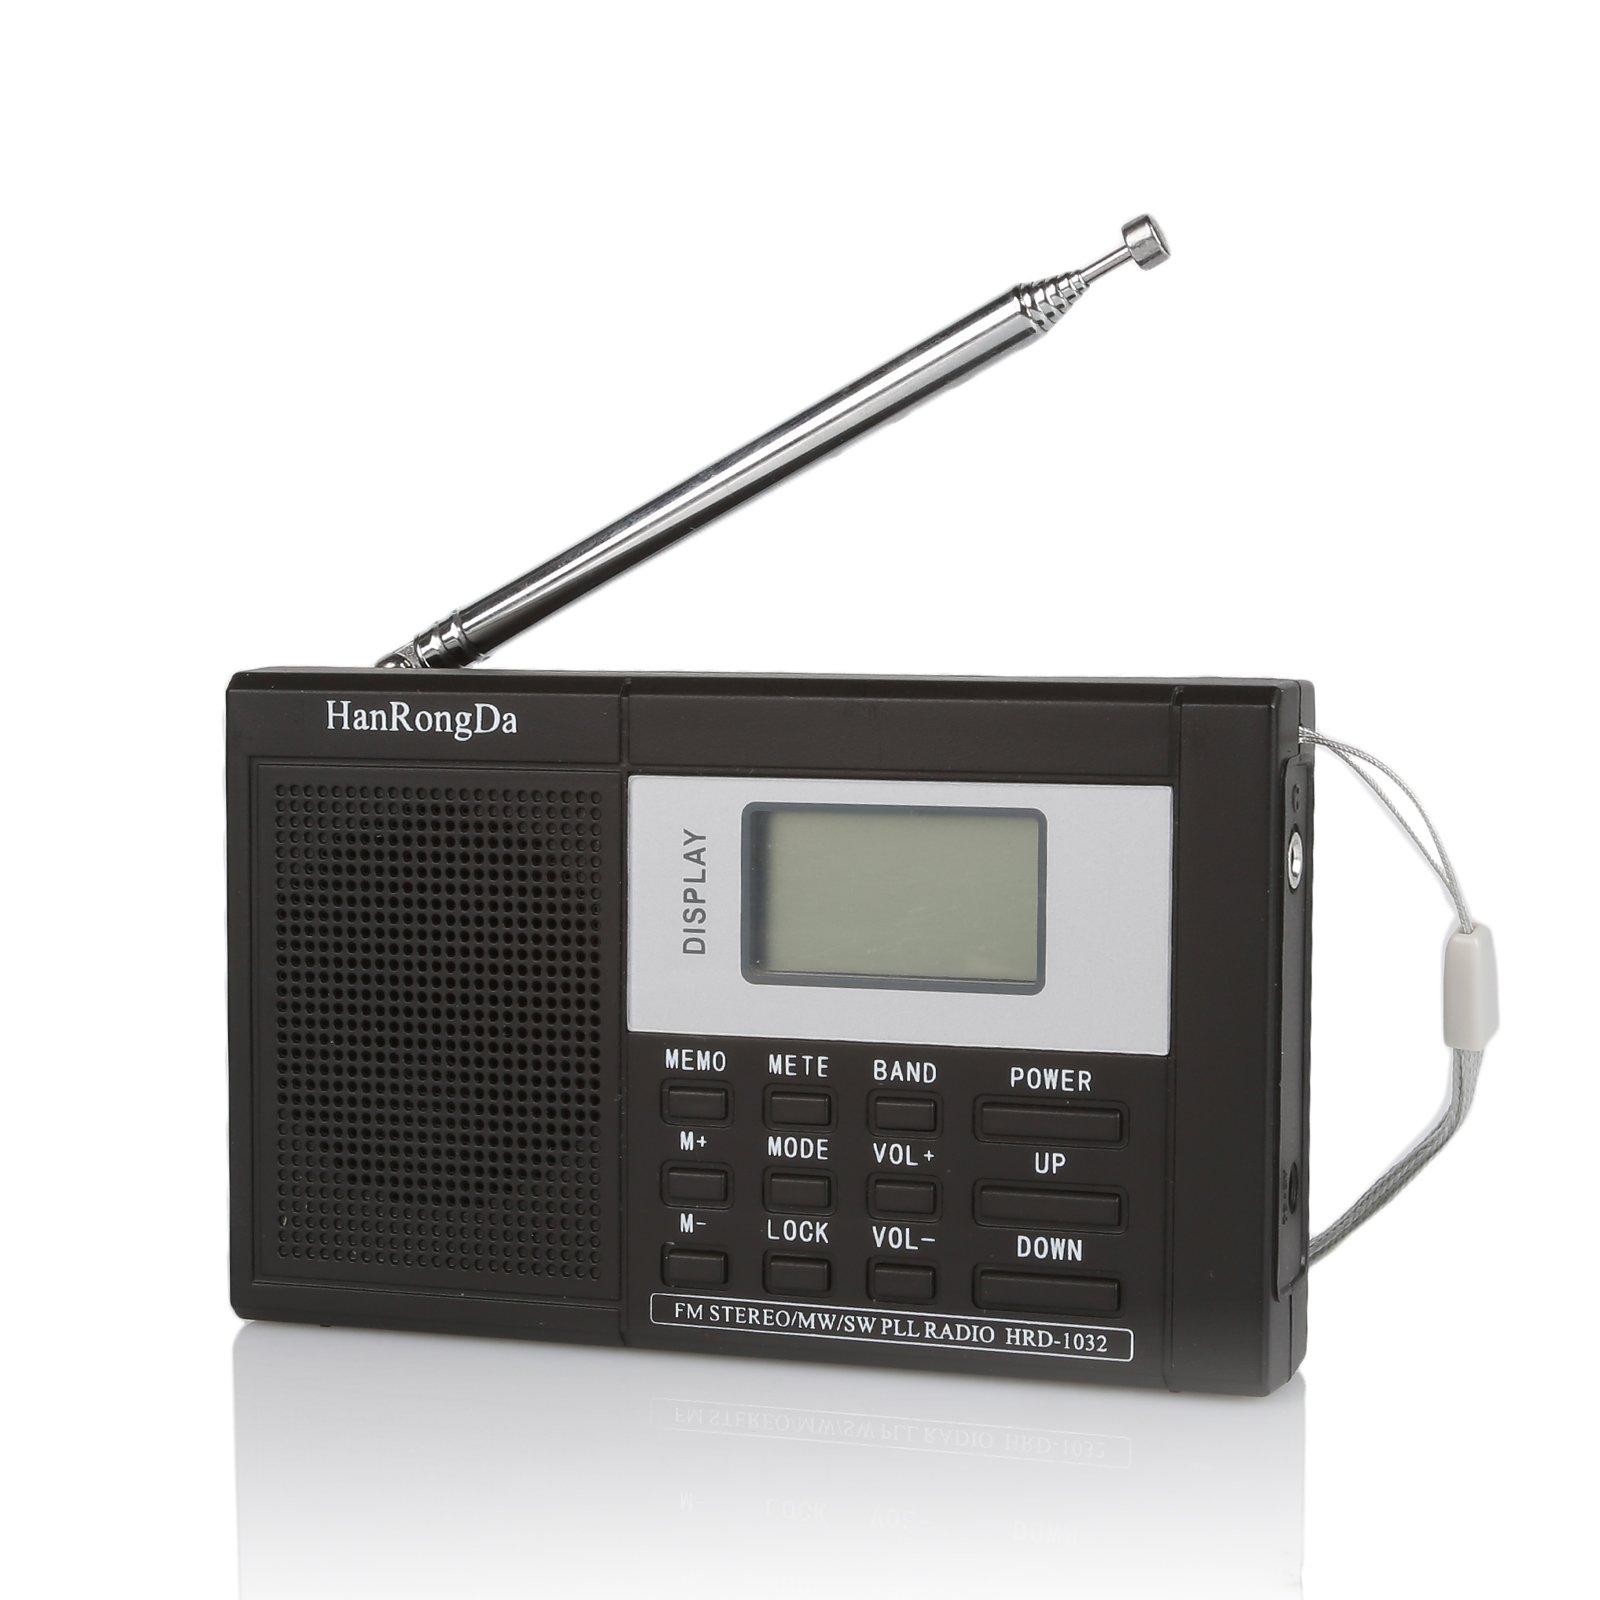 Radioddity RF22 FM AM SW World Band Portable Digital Radio Shortwave Multiband Receiver, with Clock Alarm Time Display Function, Support 3.5 mm Audio Jack